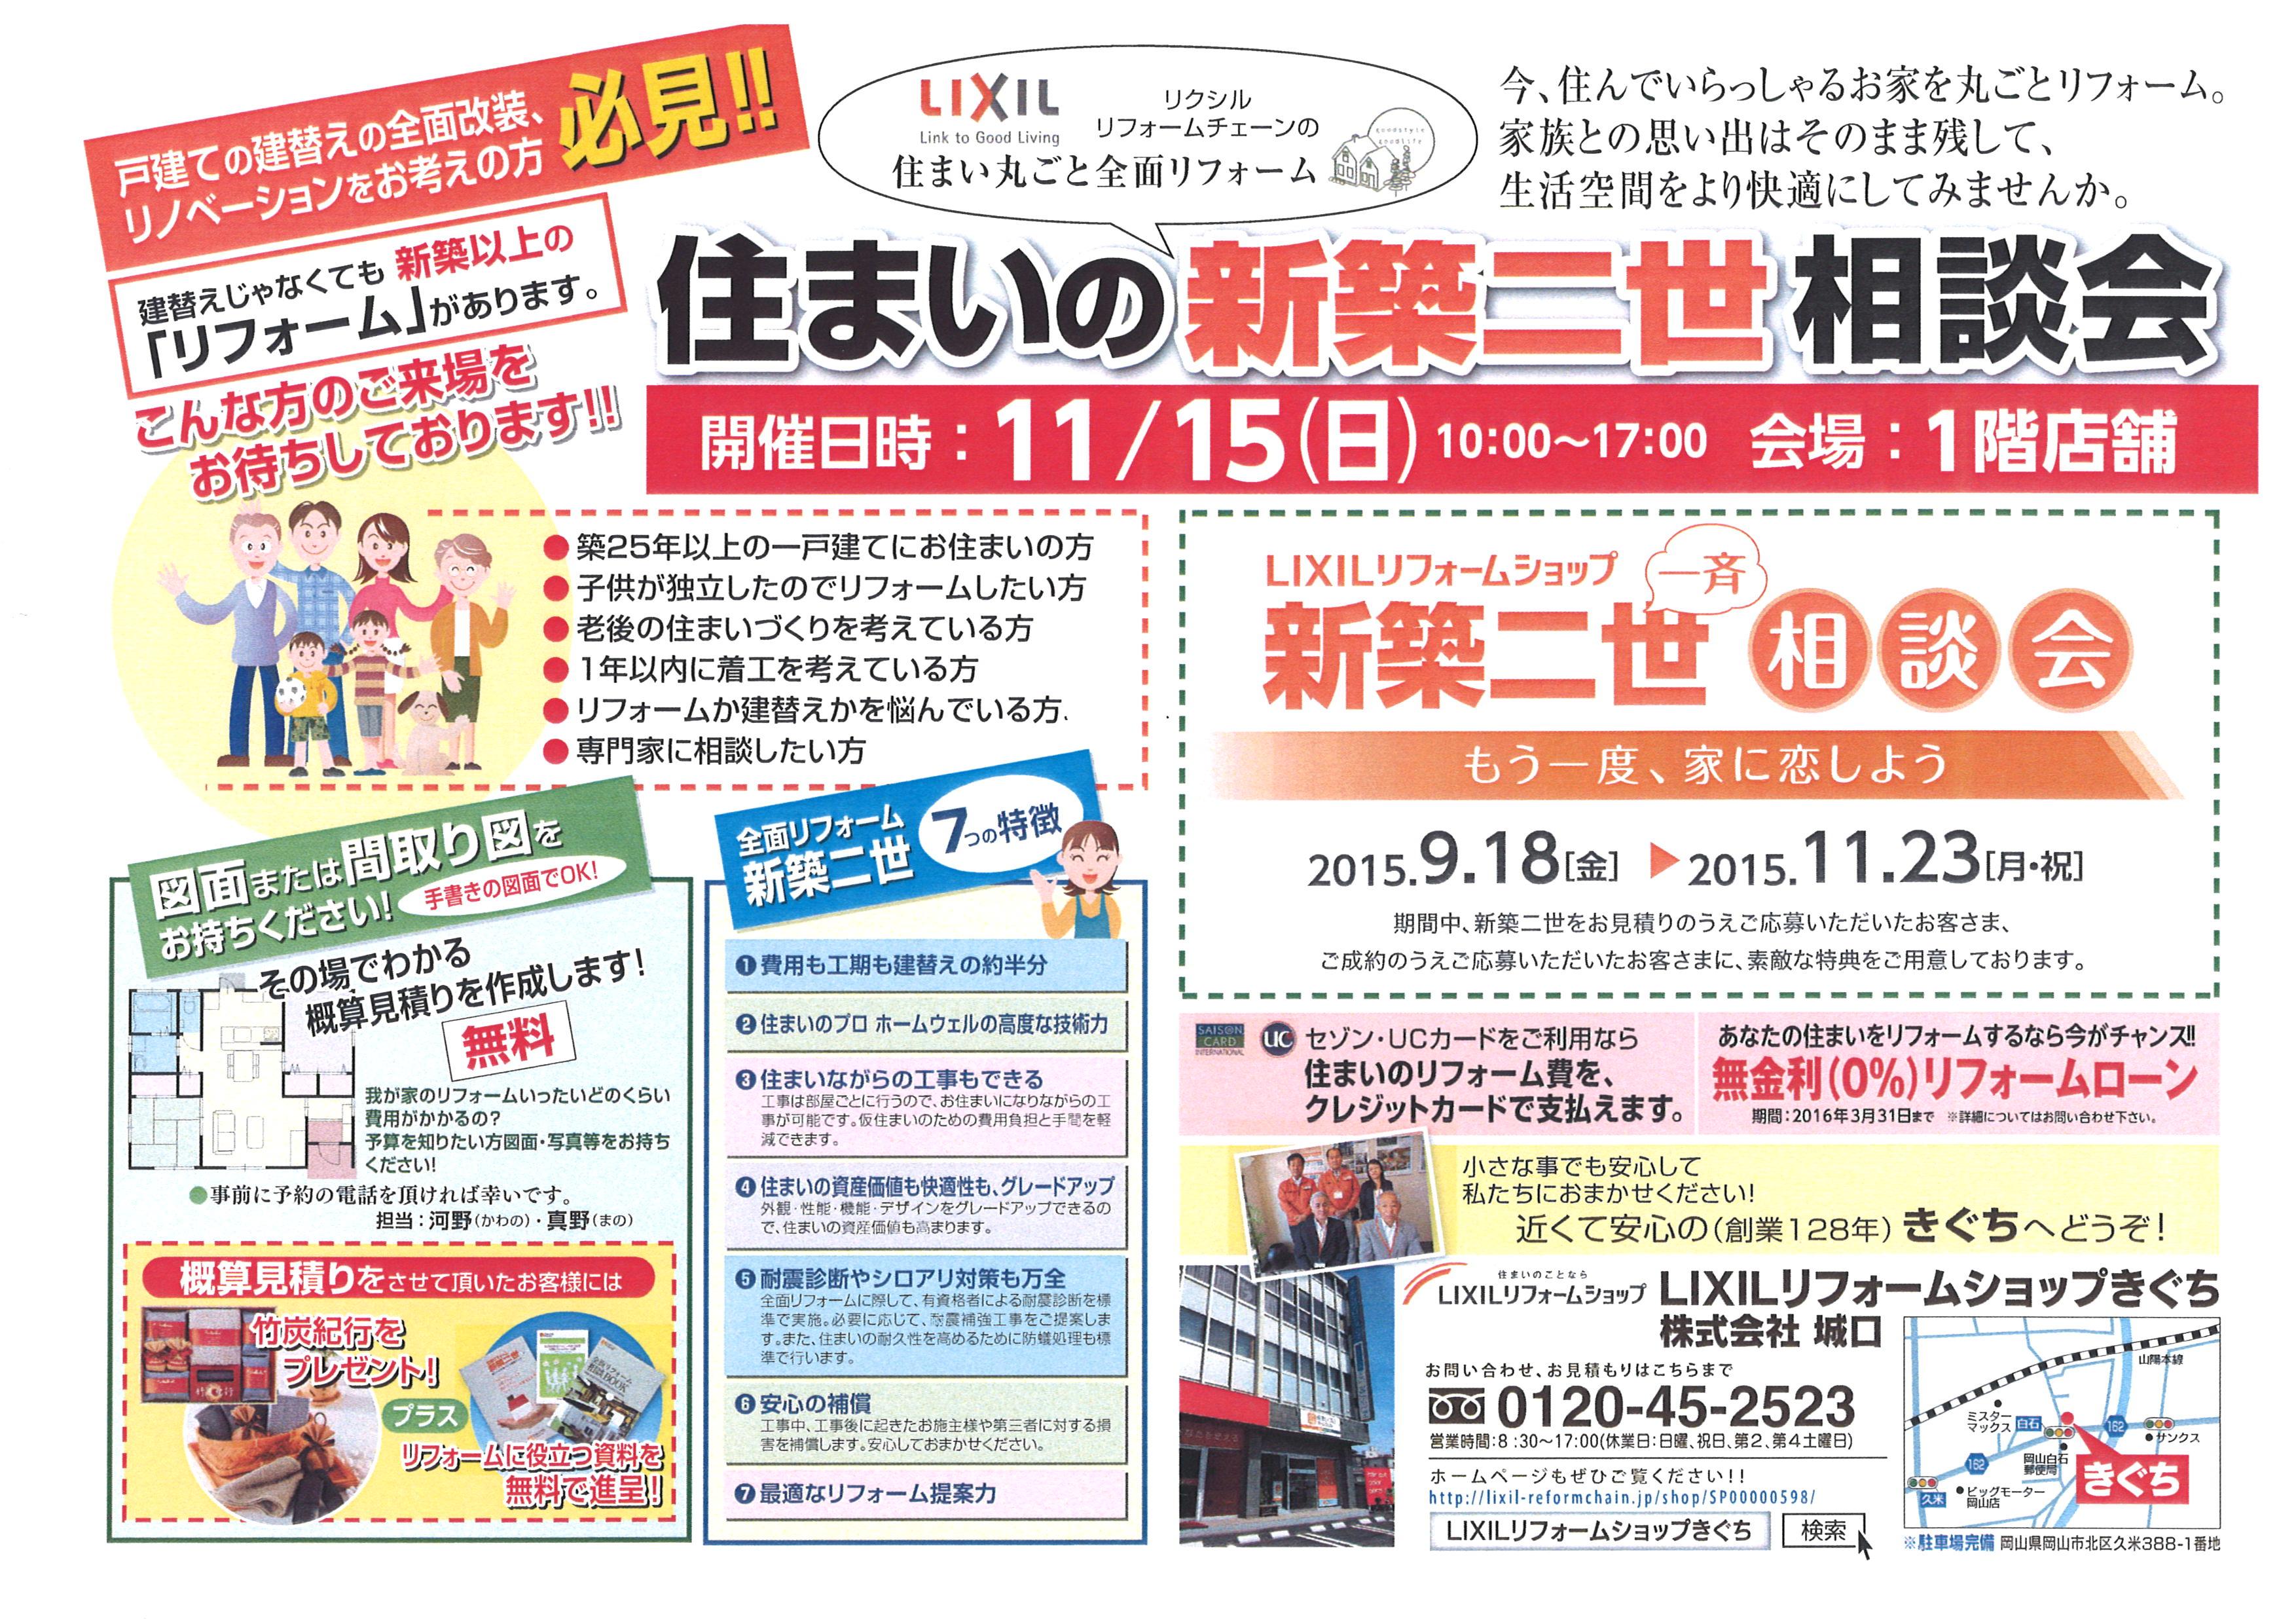 LRSきぐち新築2世相談会チラシ.jpg